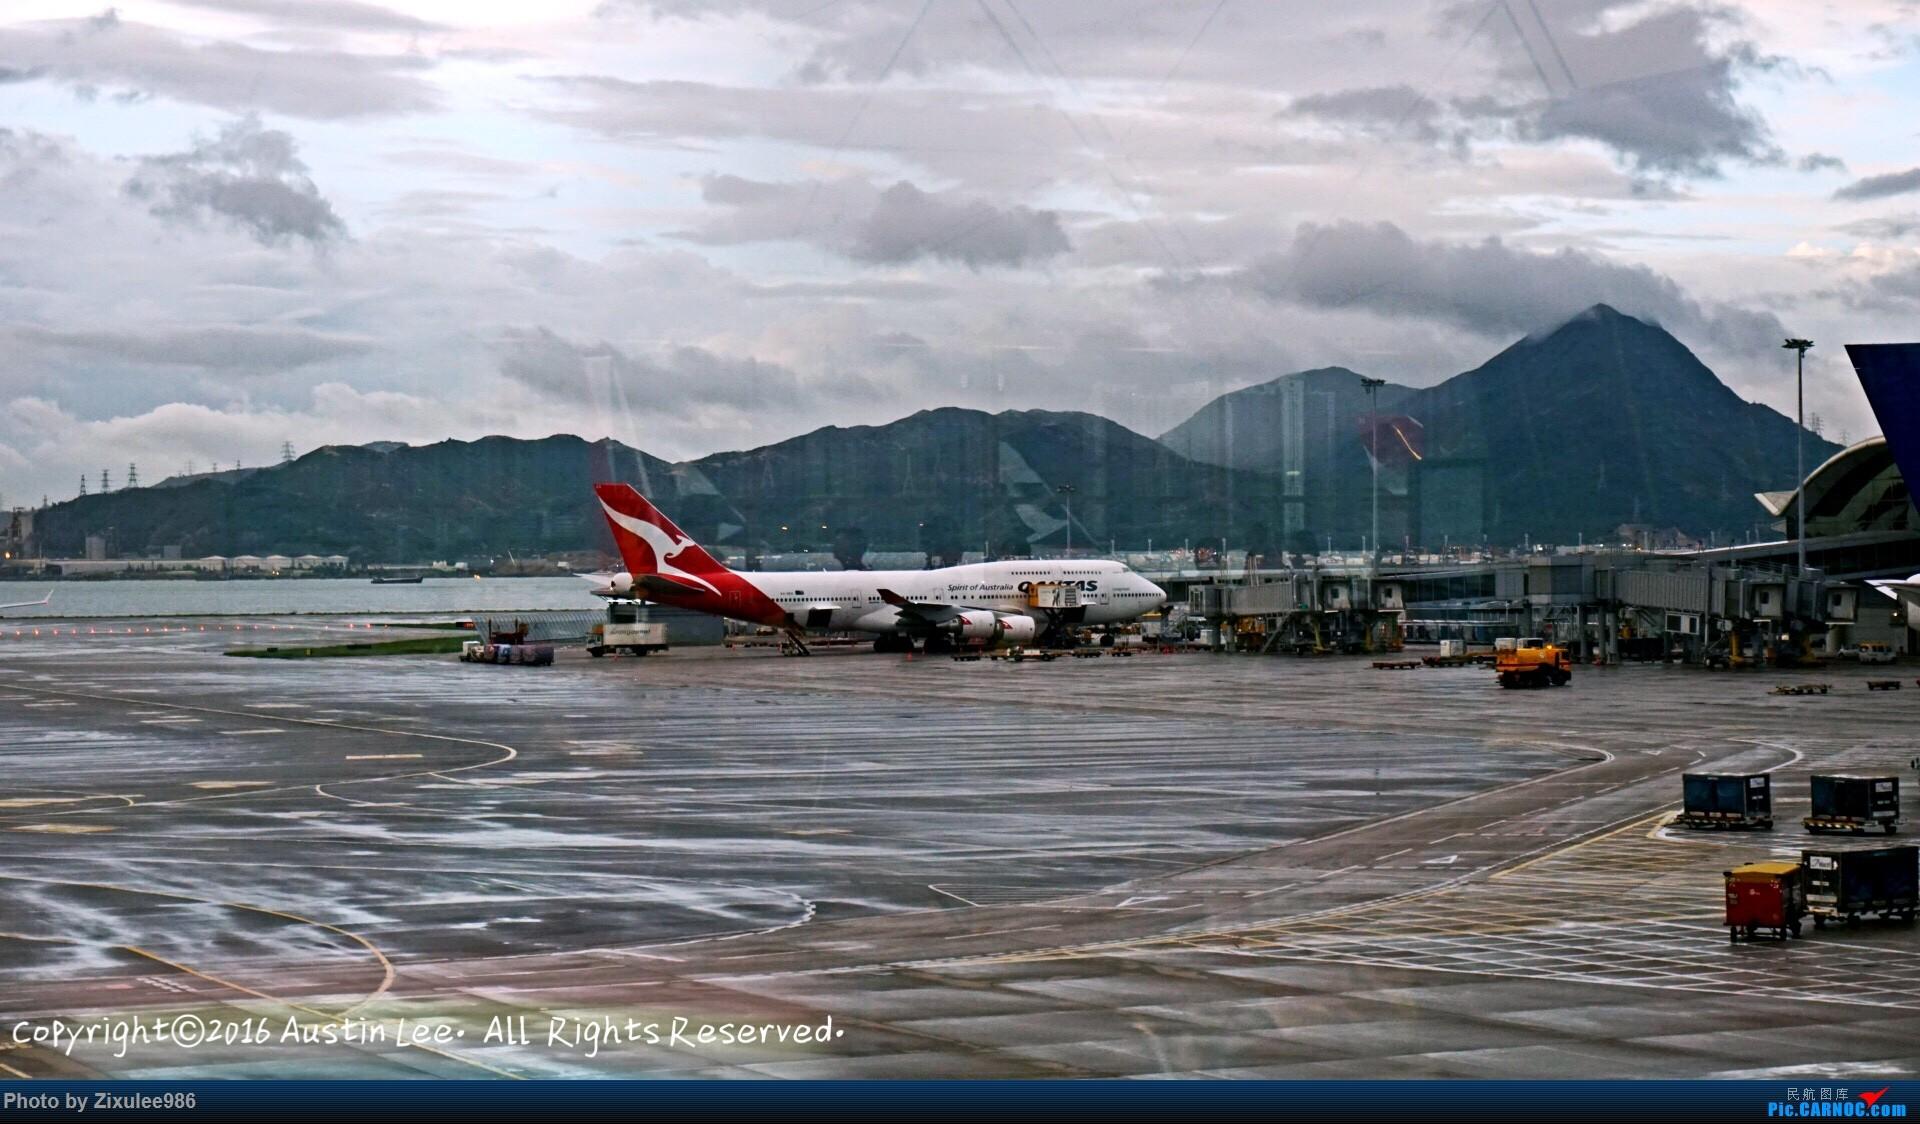 Re:[原创]论坛修复后第一波~三年来旅游途中的拍机精选~不定时更新 BOEING 747-438(ER) VH-OEH 中国香港国际机场